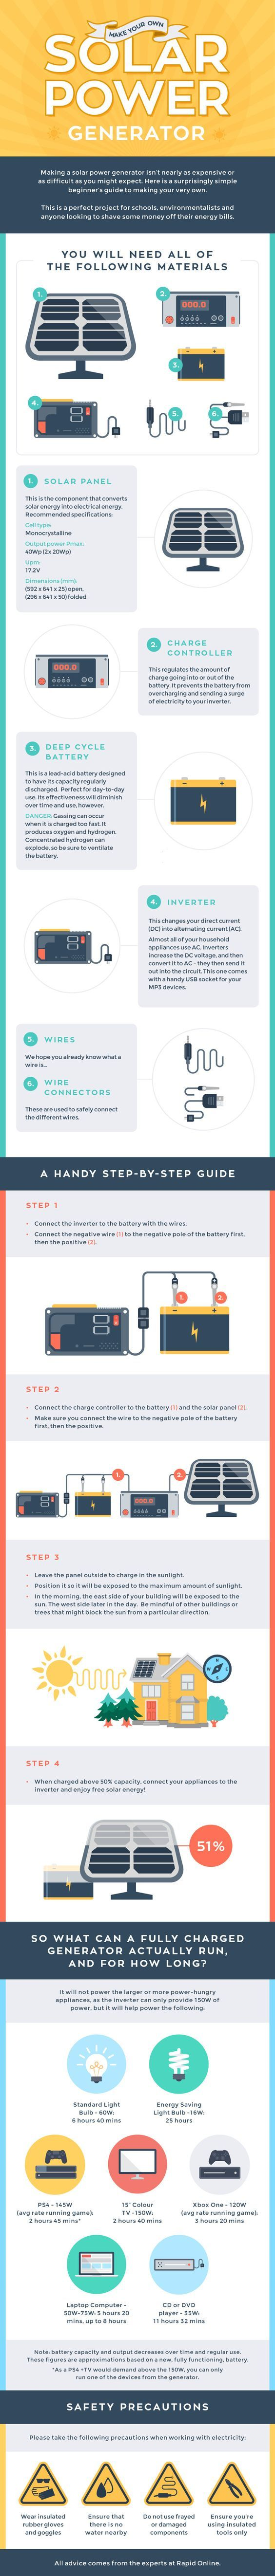 Make Your Own Solar Power Generator #infographic #Energy #SolarPower